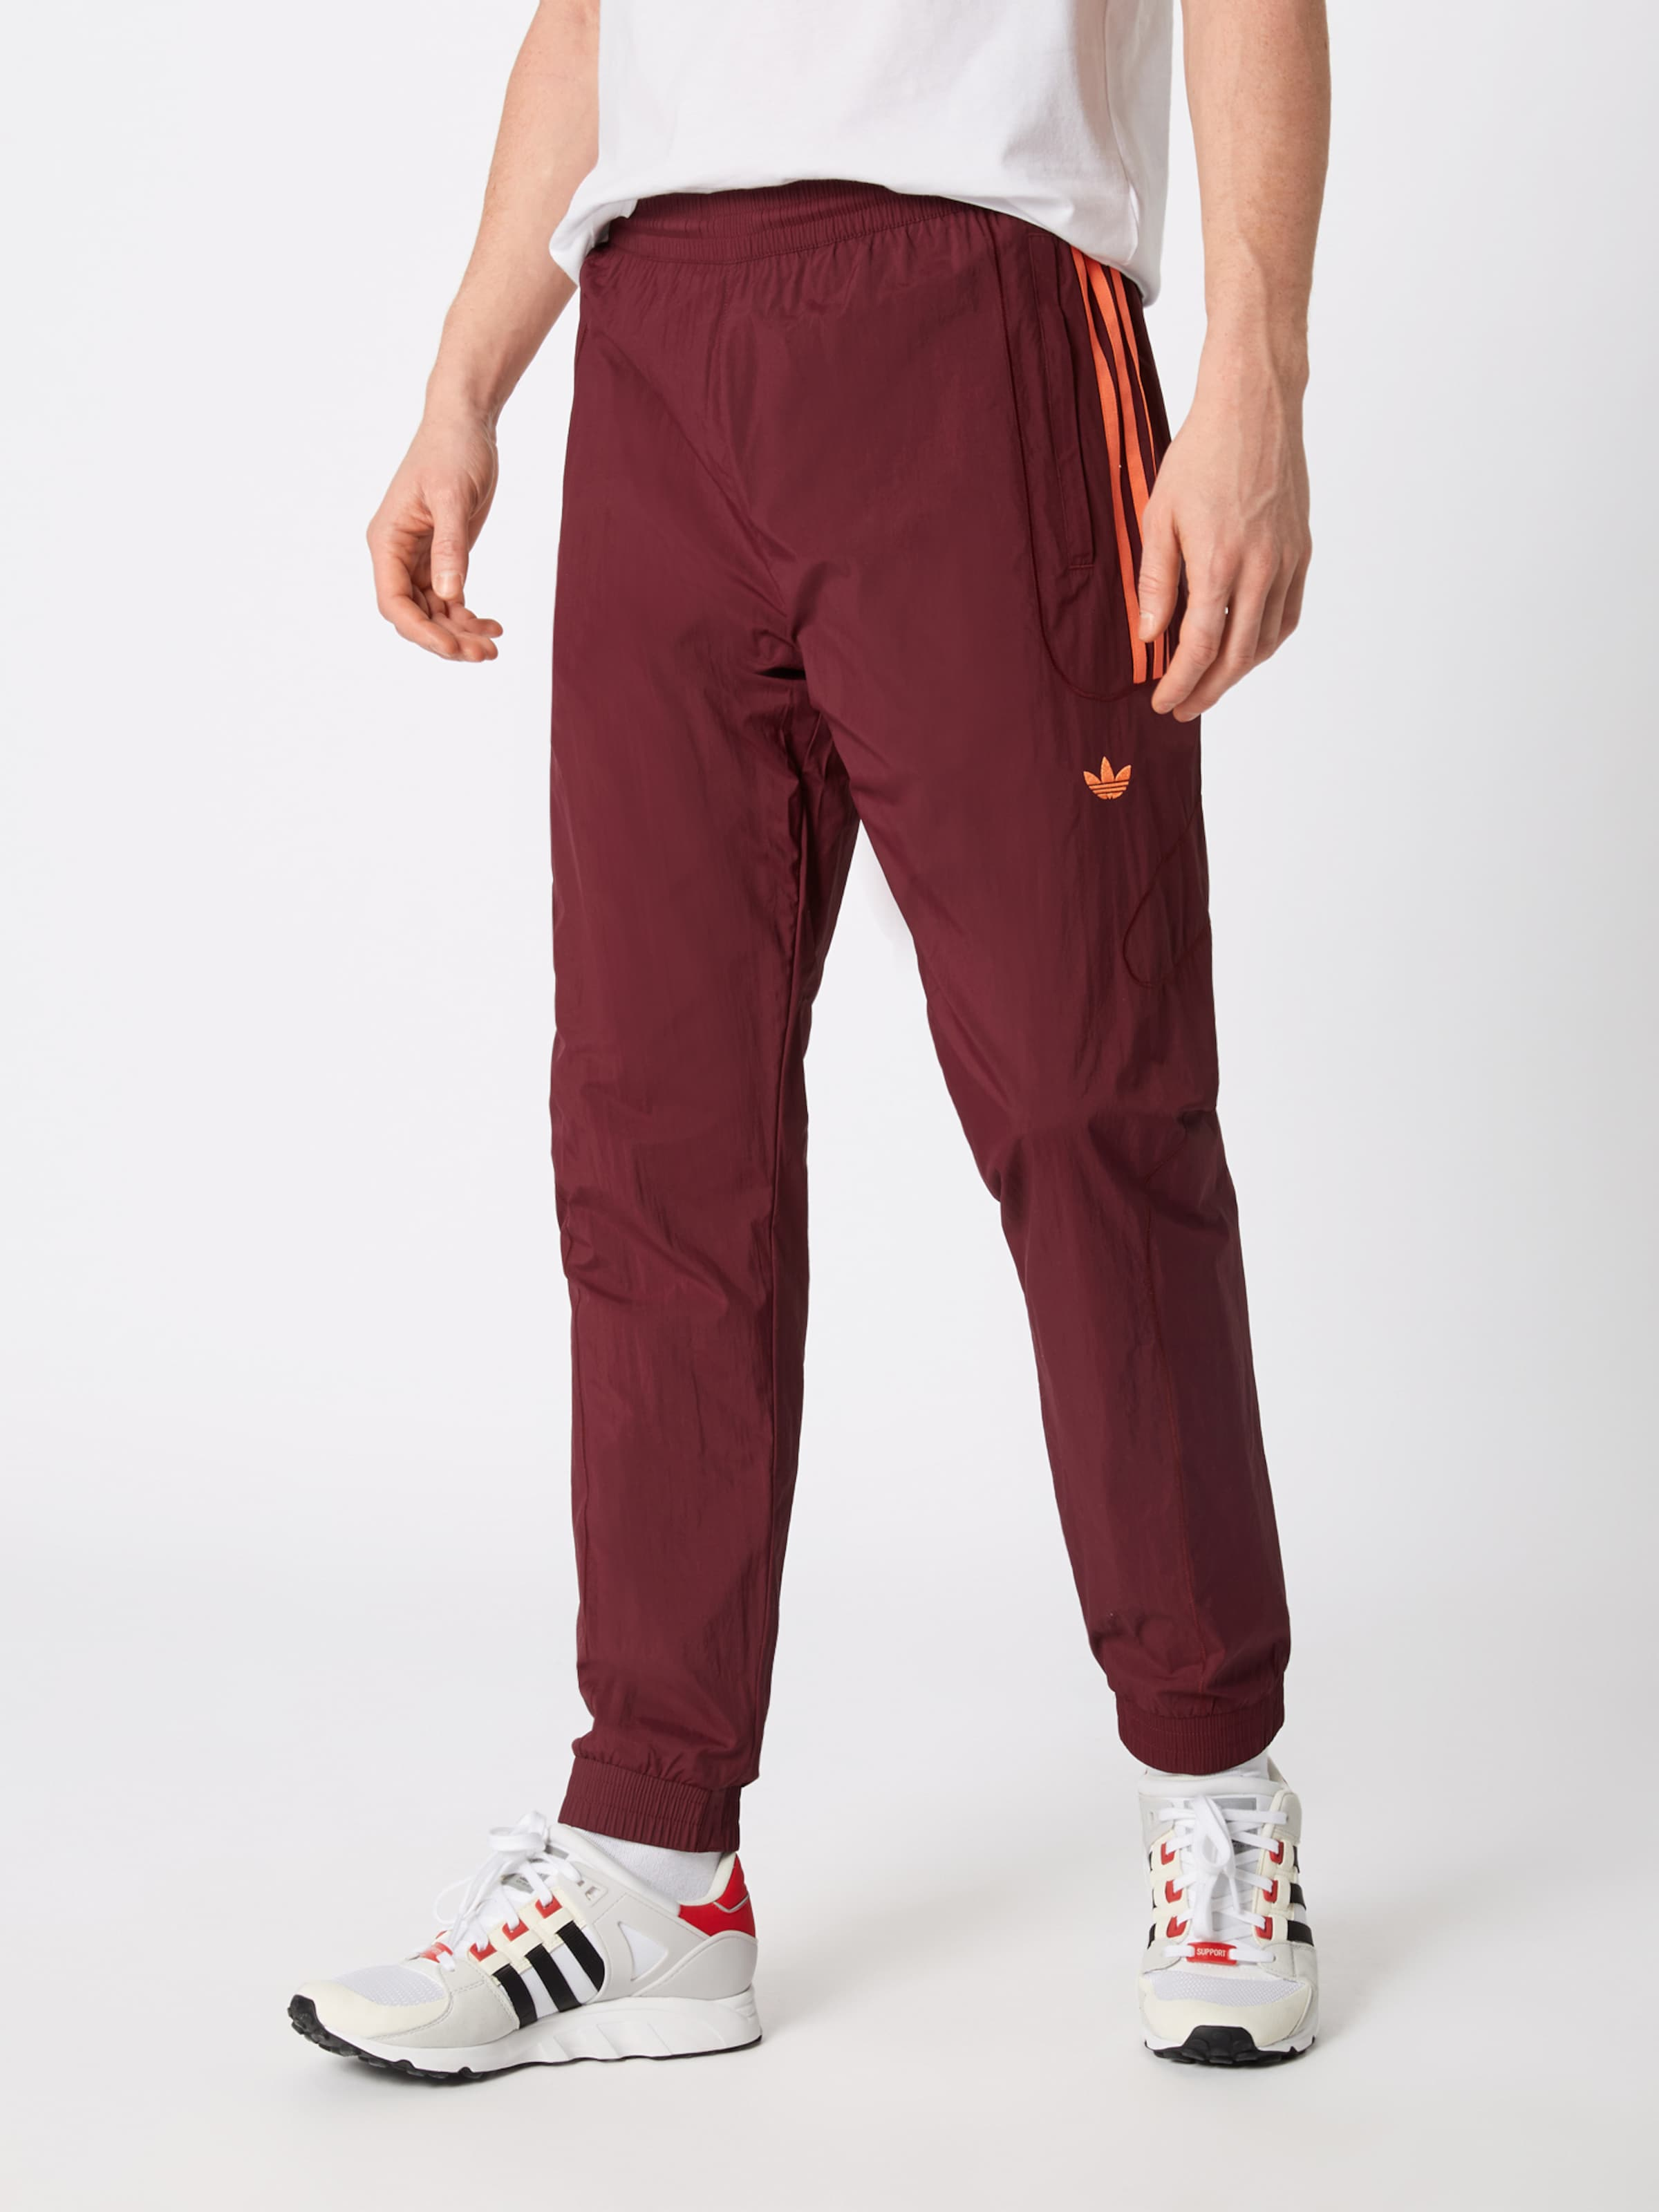 Adidas Pantalon Tp' Bordeaux Originals 'flamestrk En Wv dCoxWBre